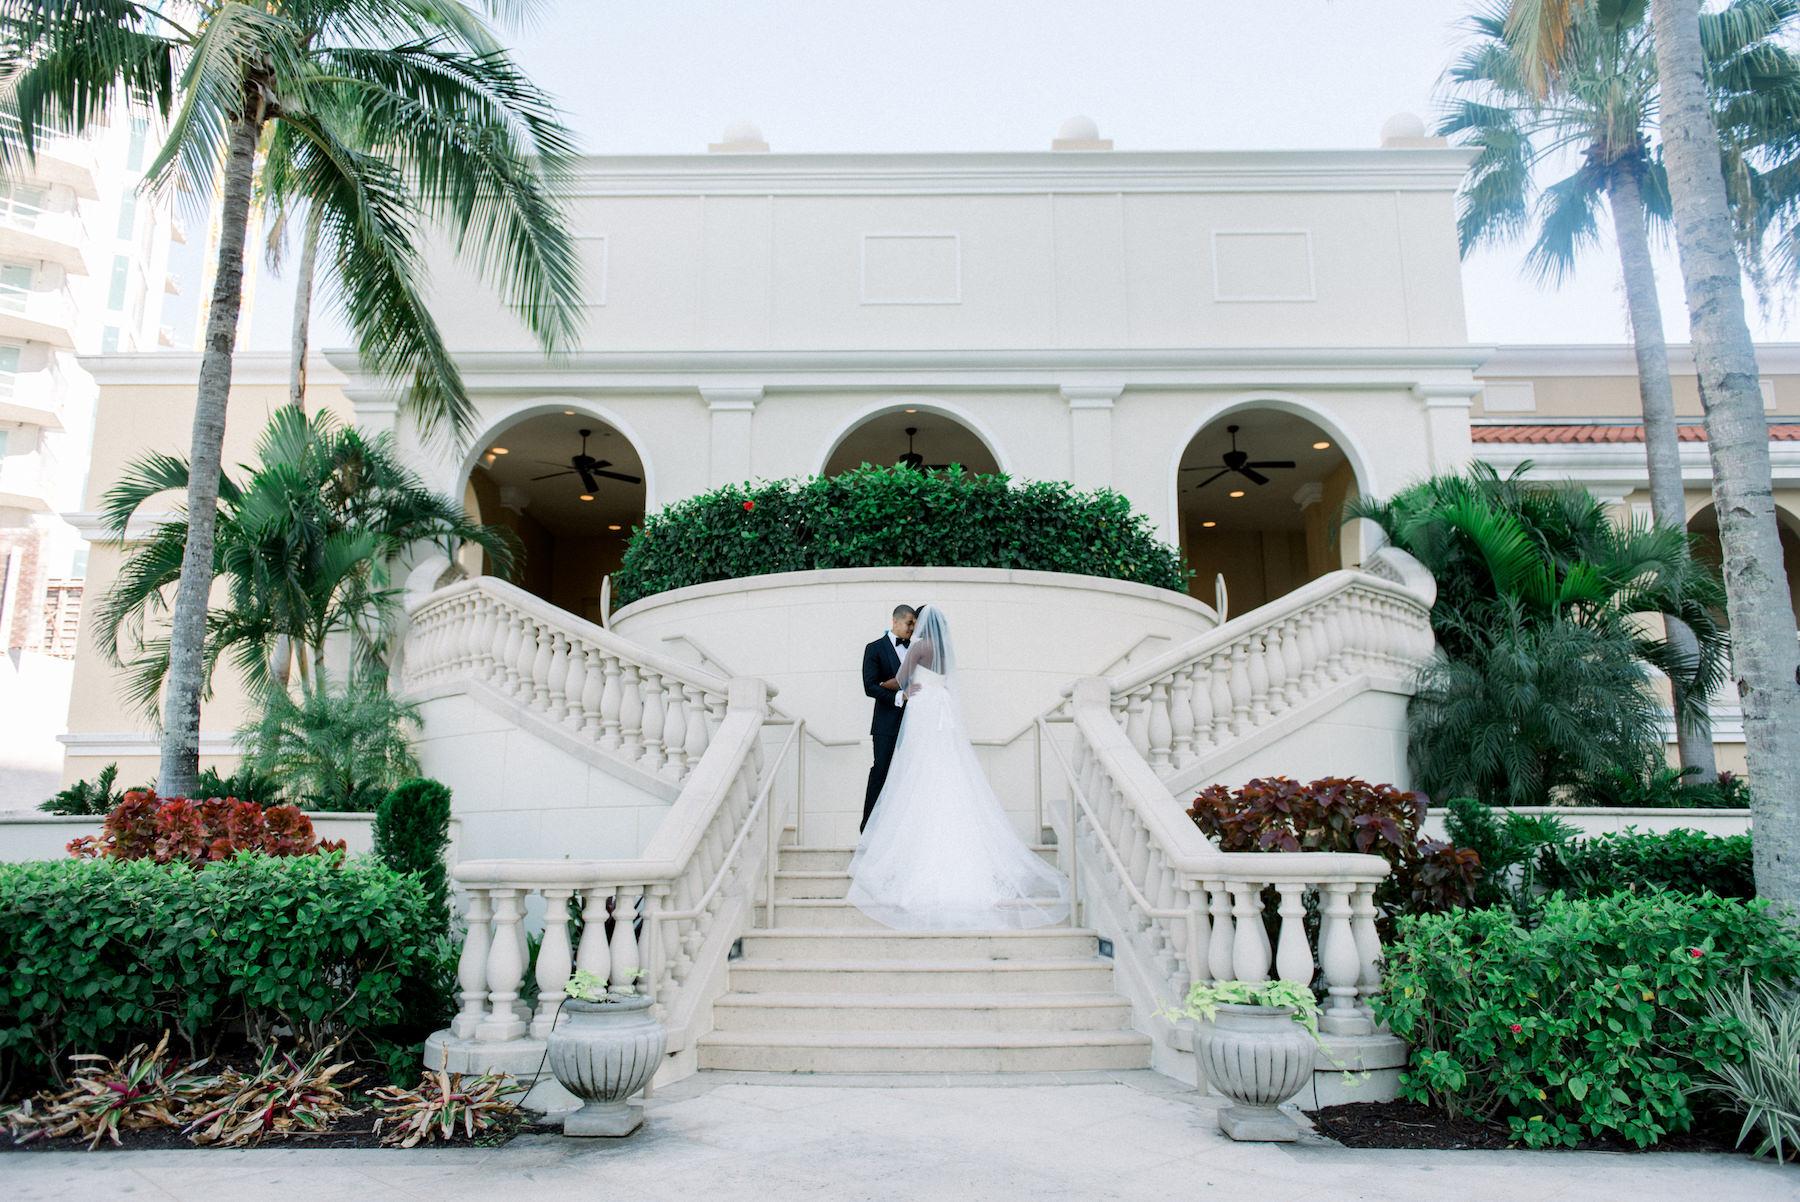 Classic Bride and Groom Wedding Portrait on Staircase of Hotel Wedding Venue Ritz Carlton Sarasota